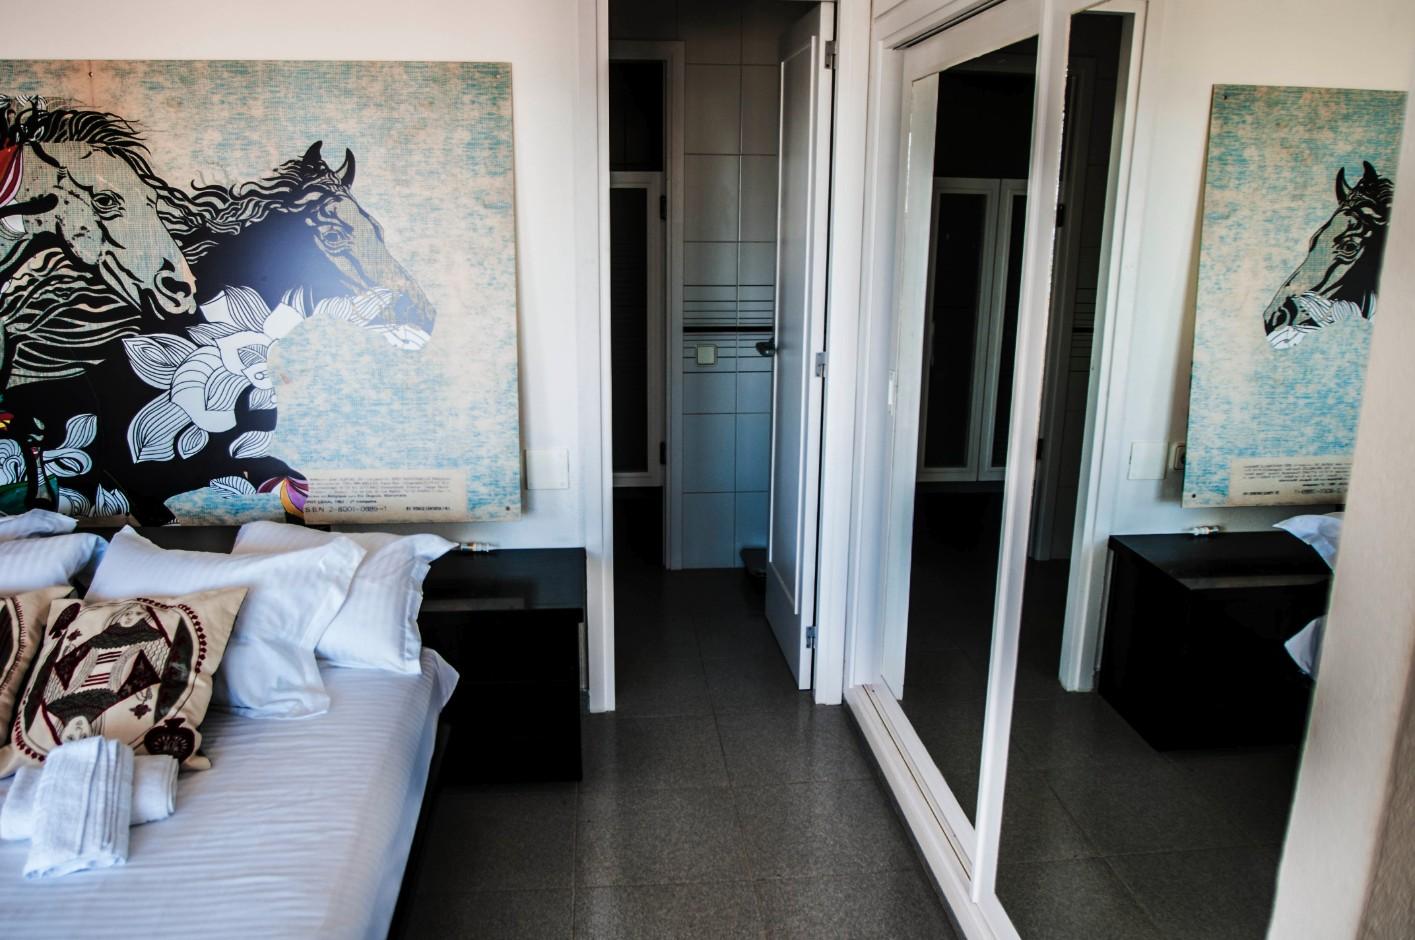 concierge - bureau - romania - bamboo - fratelli - player - le gaga - uanderful - boa - travel - bucharest - accommodation - entertainment - rent a car - flight - restaurants - events - private party